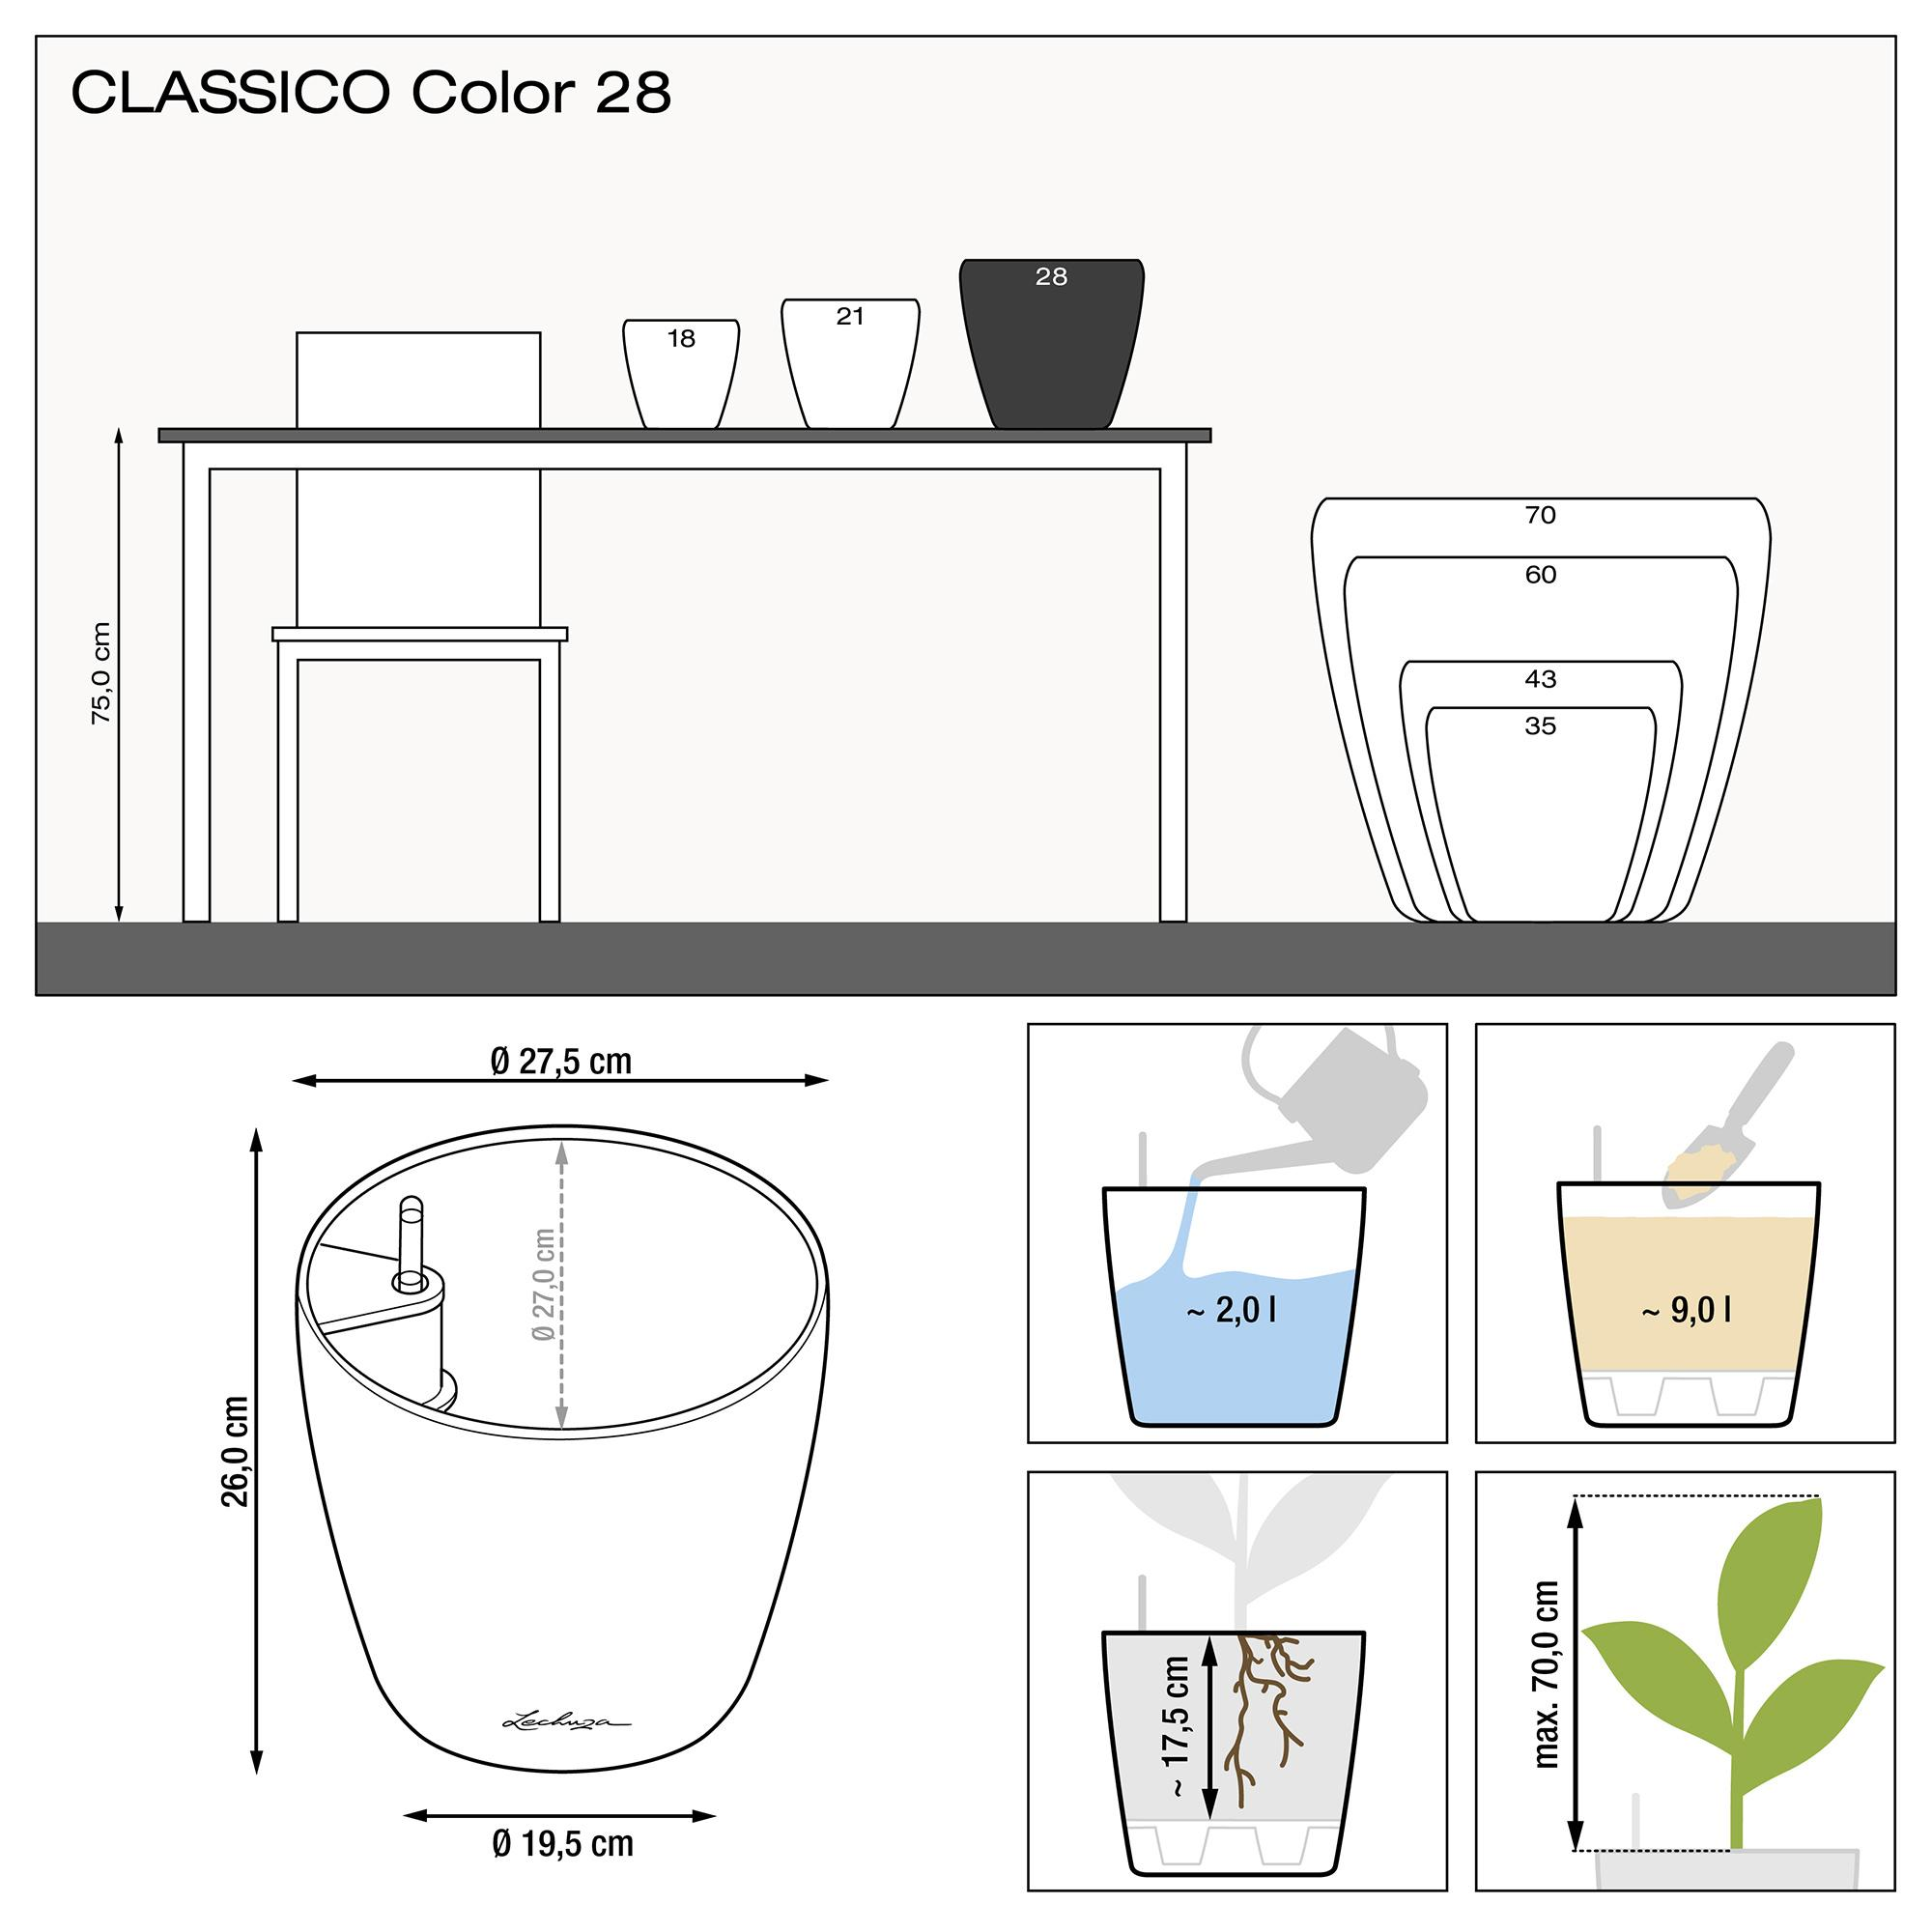 CLASSICO Color 28 purple garnet - Image 2